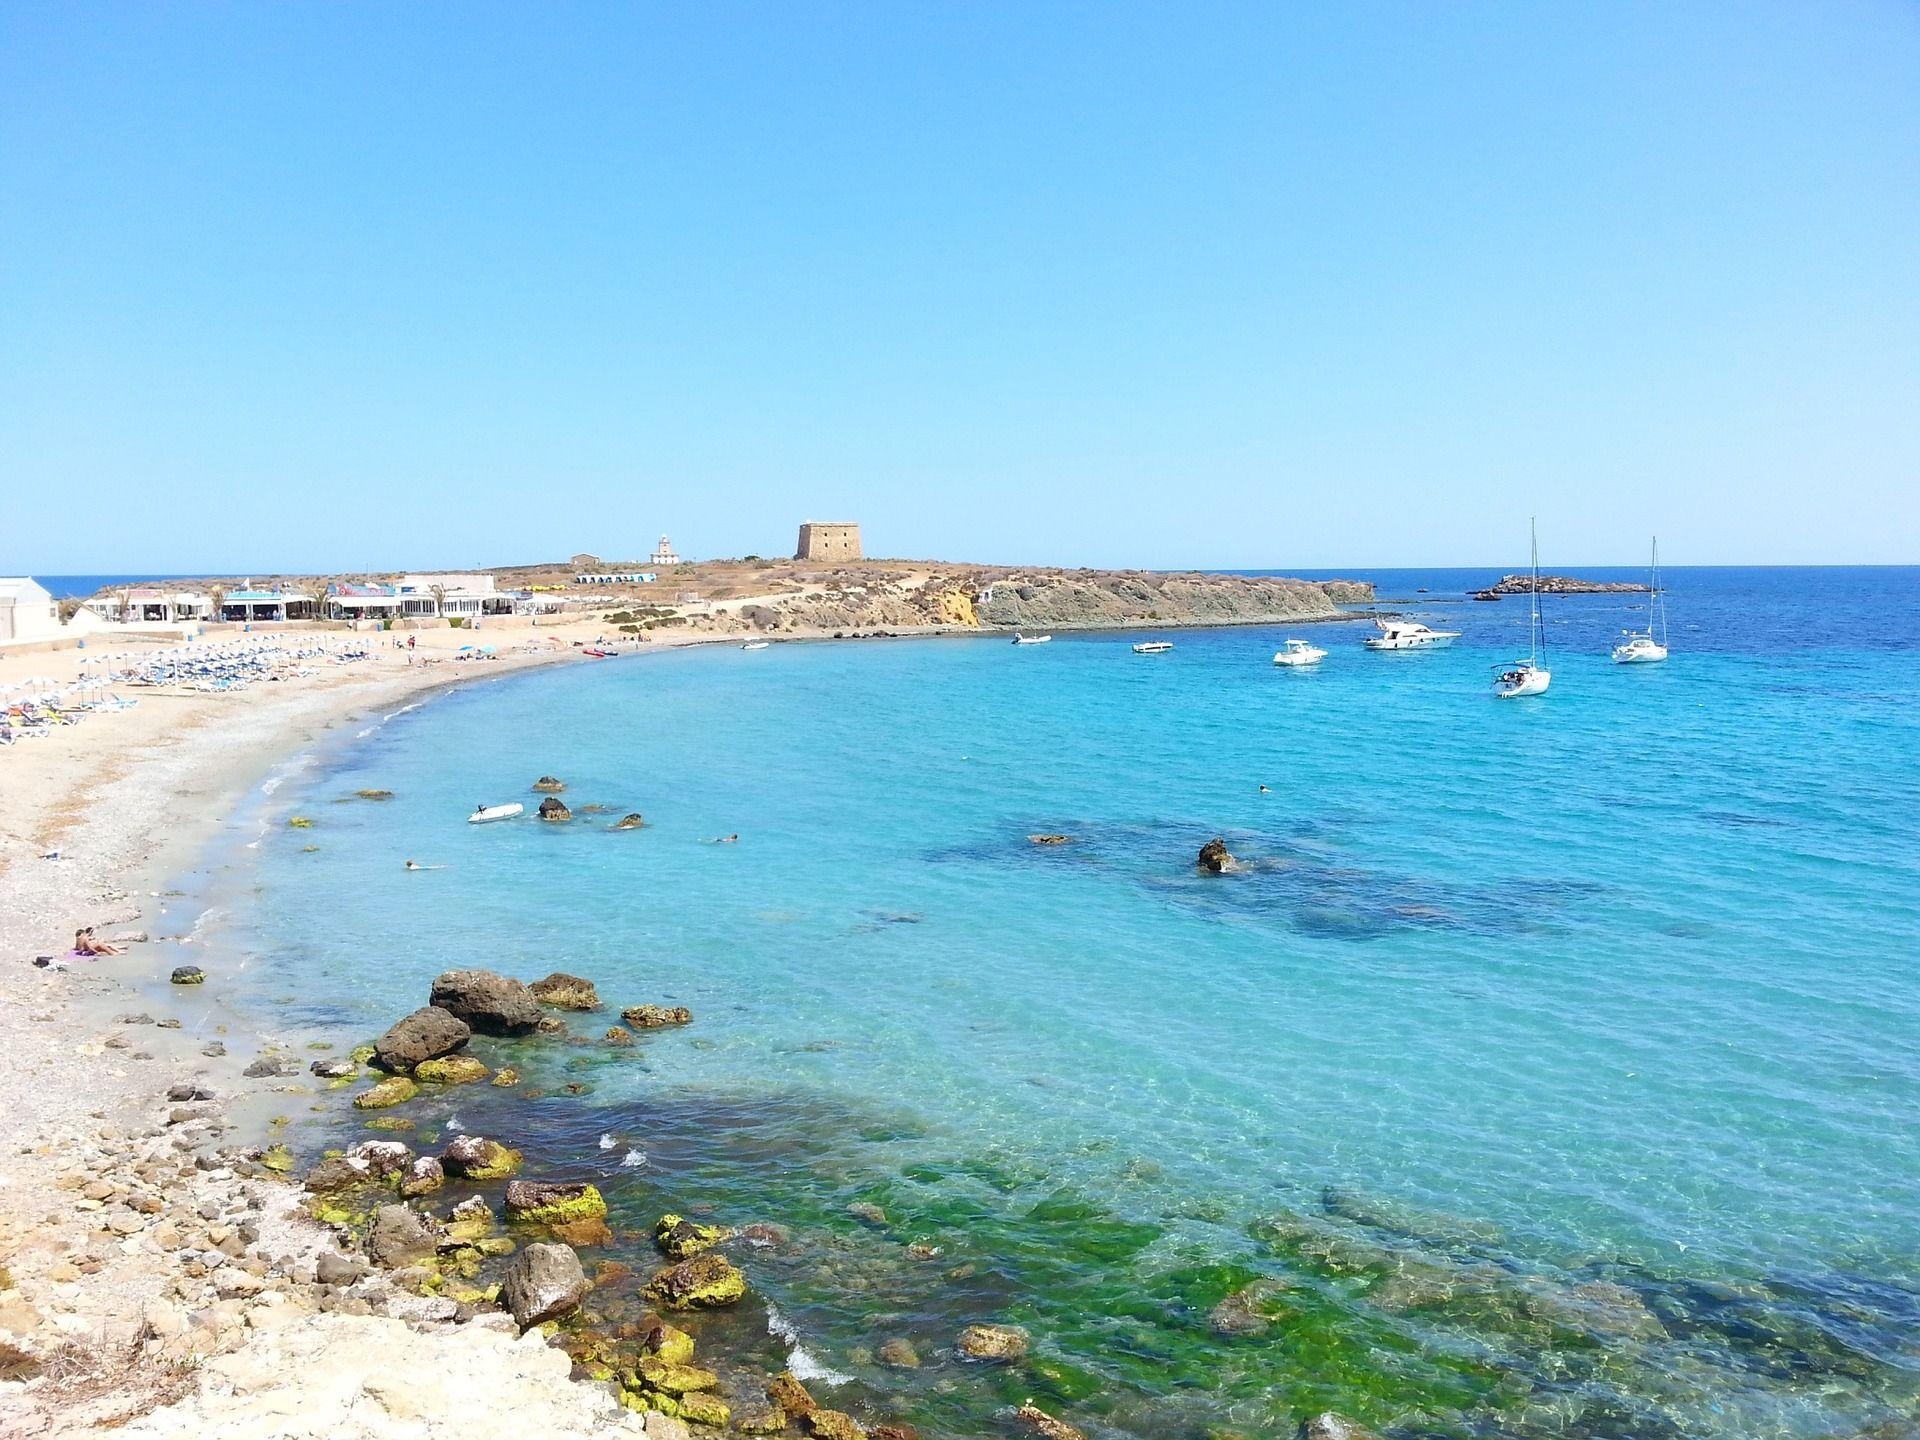 Alt Isla-de-Tabarca_Alicante, tittle Isla-de-Tabarca_Alicante